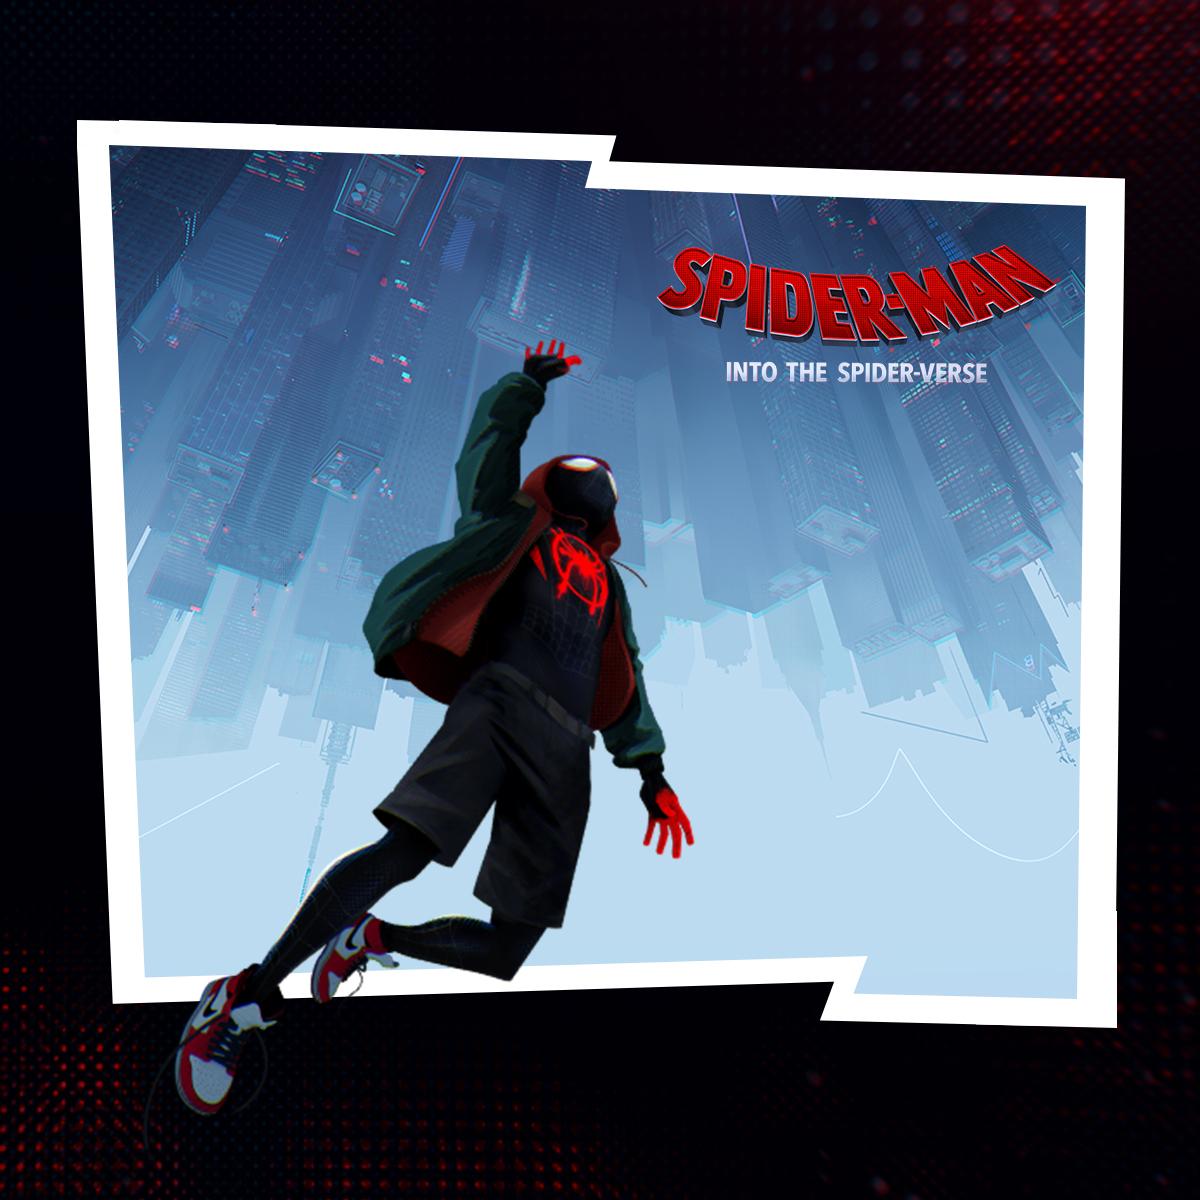 Spider-Man-thumbnail.jpg